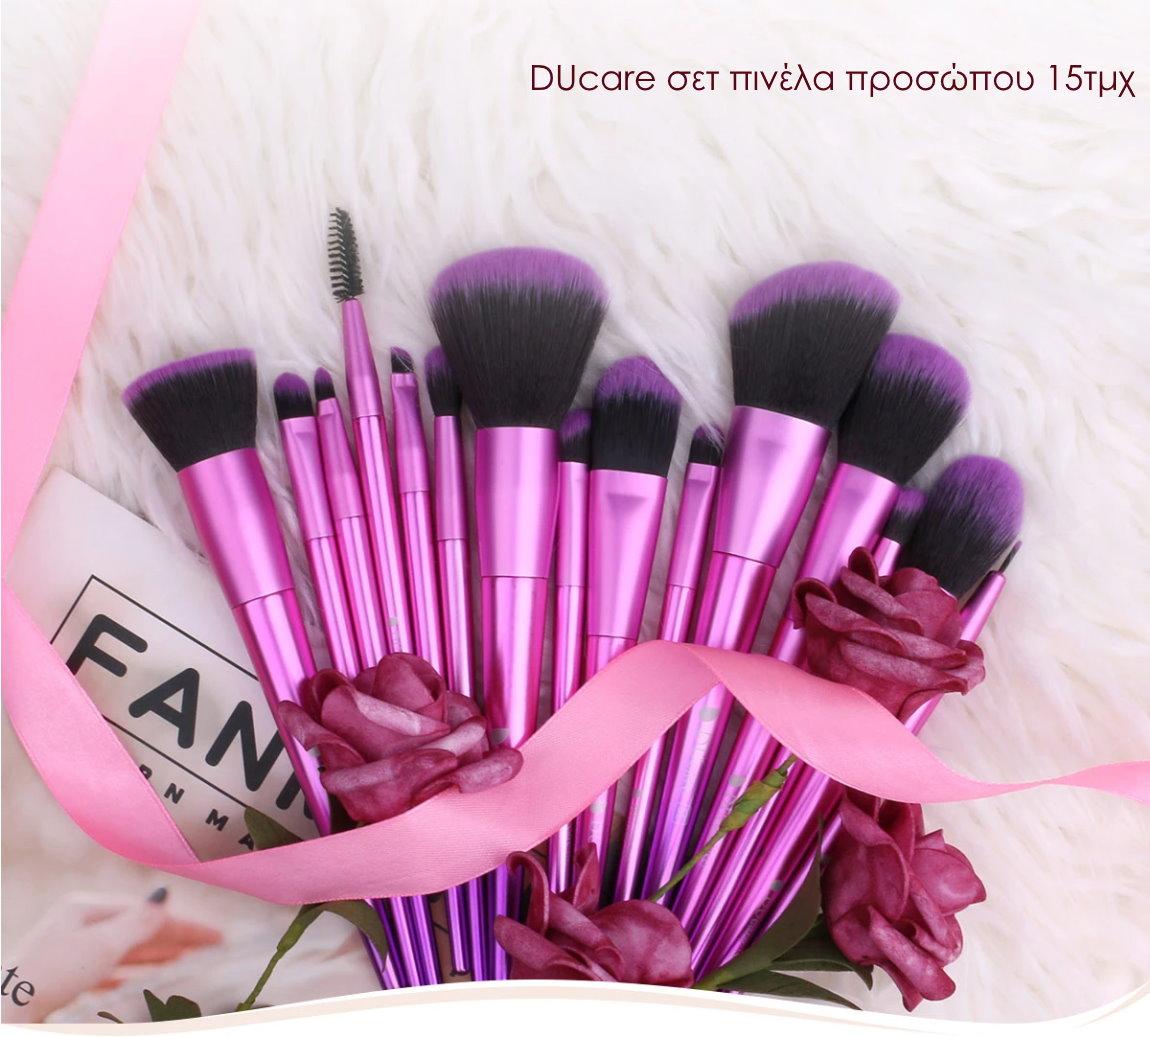 DUcare R1503 Σετ Πινέλα Μακιγιάζ Φούξια 15τμχ